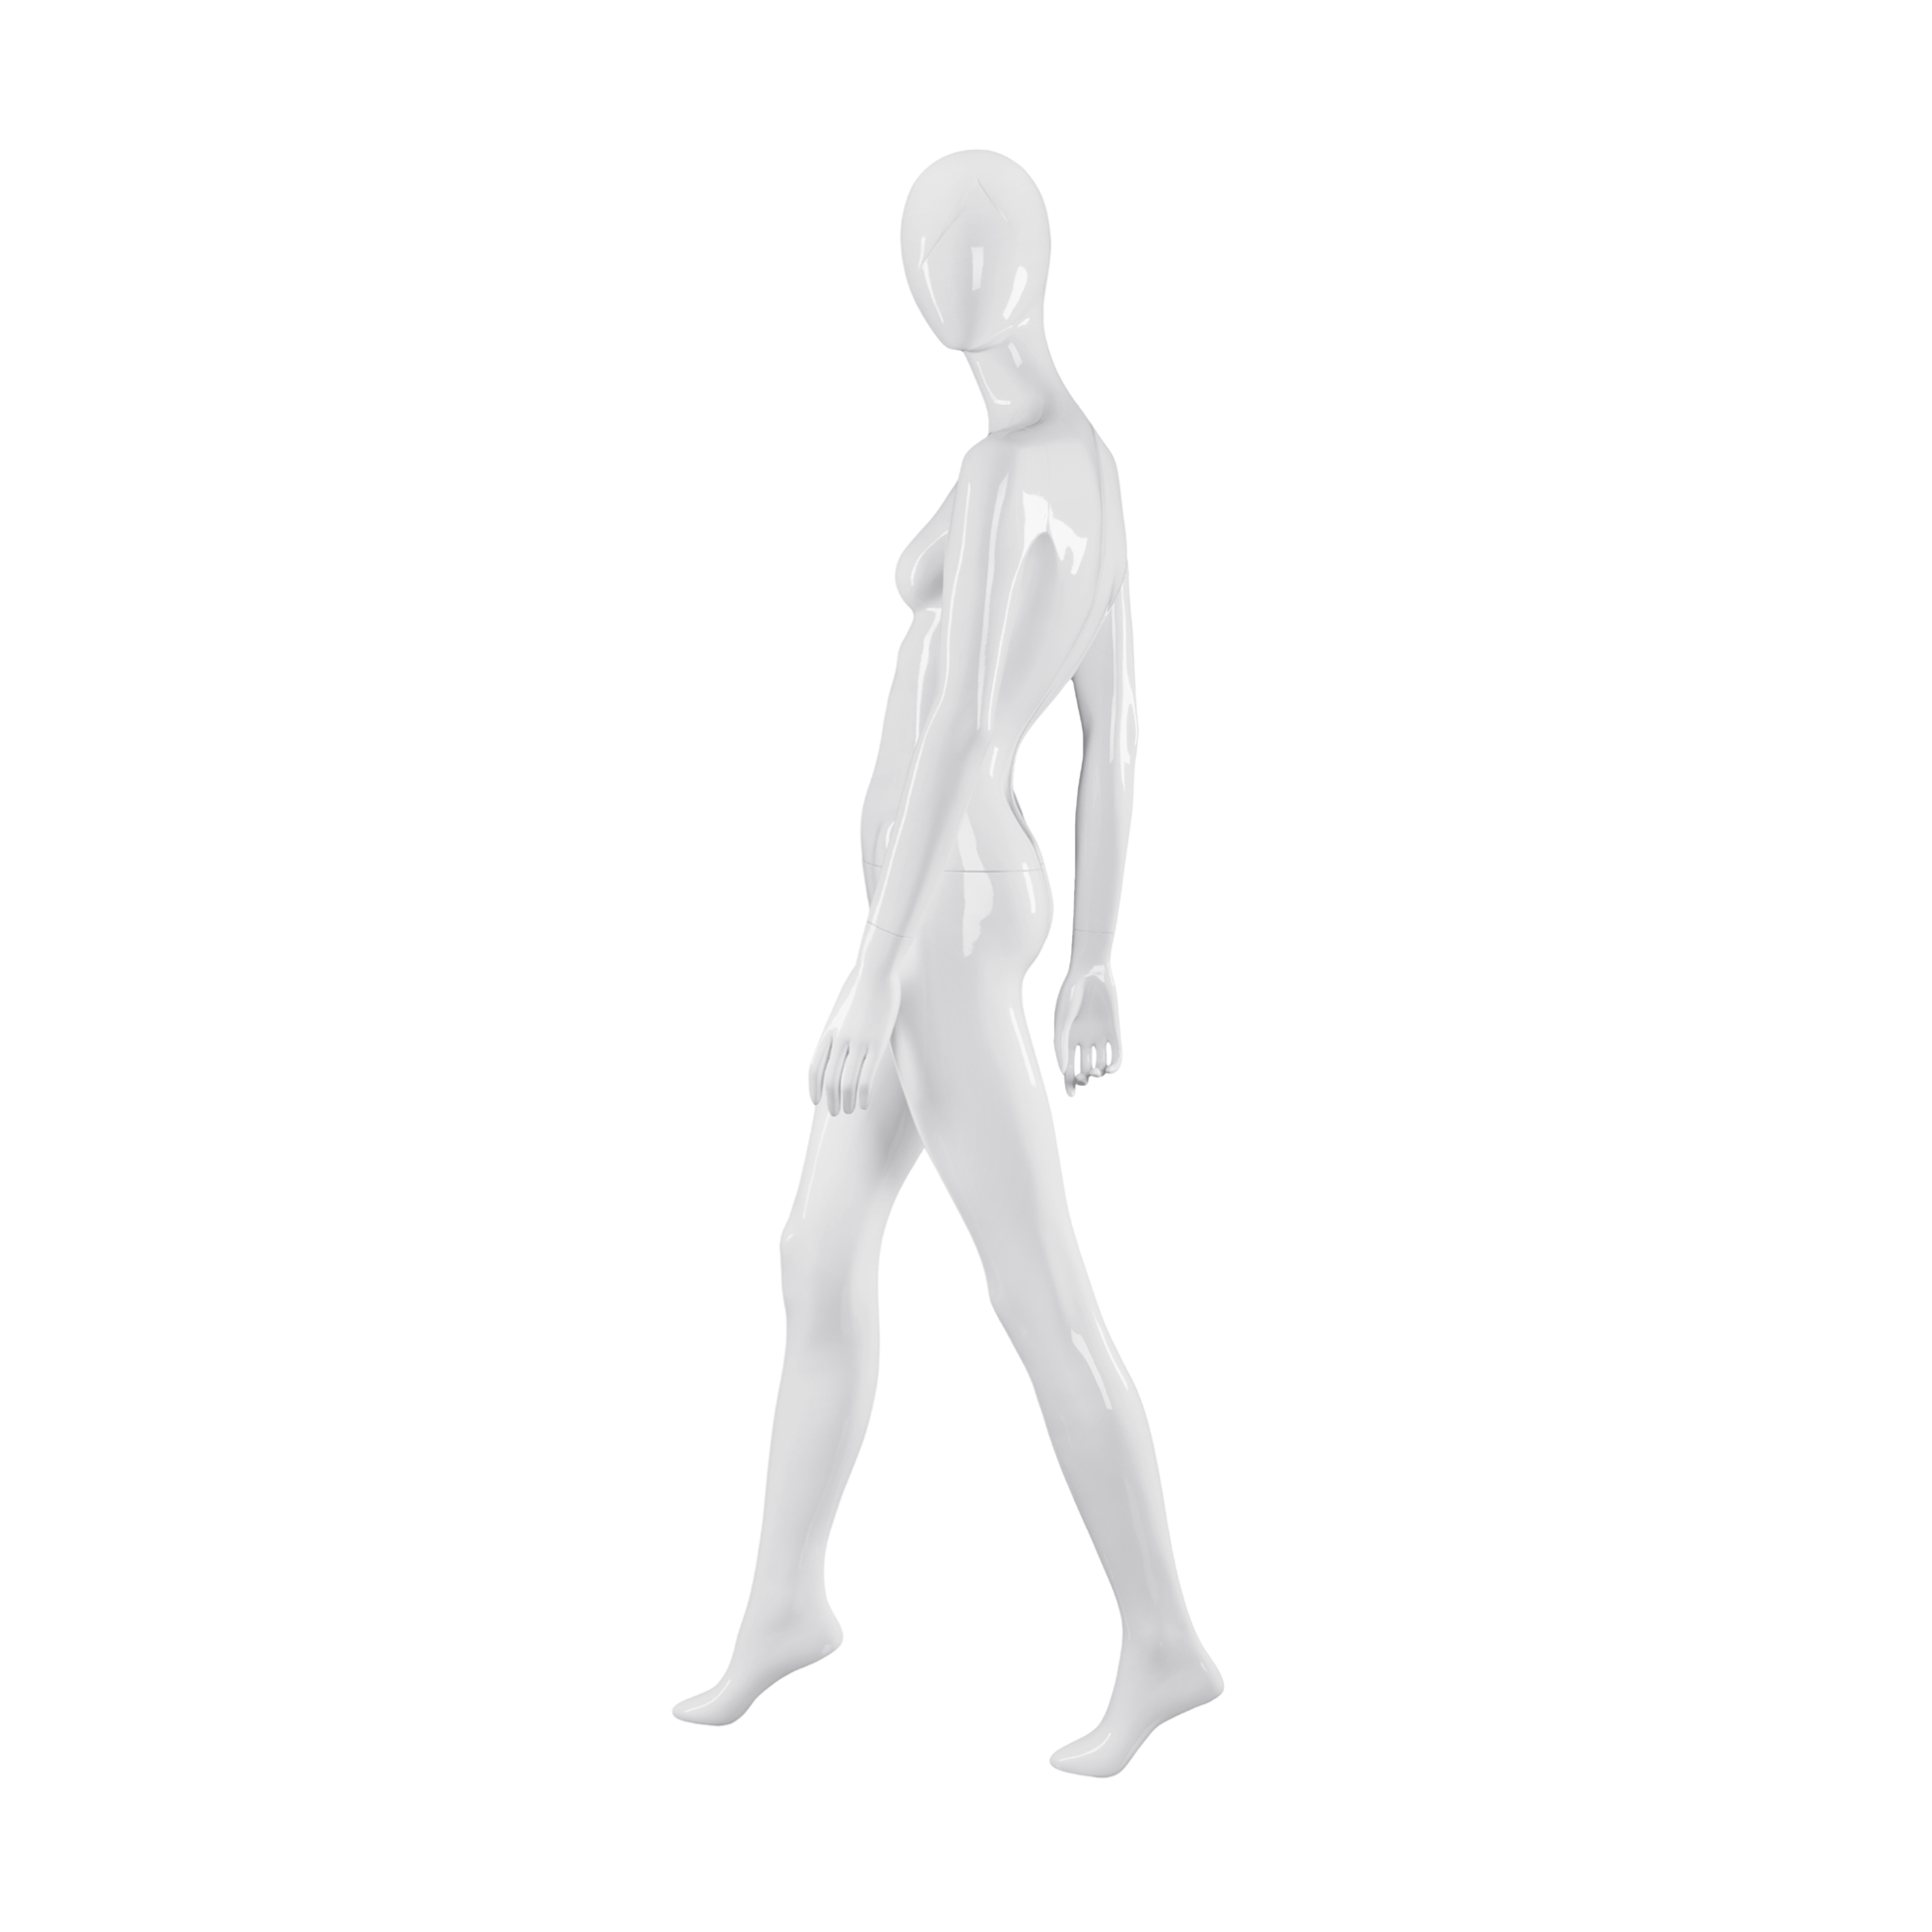 Female mannequin - PNG Mannequin